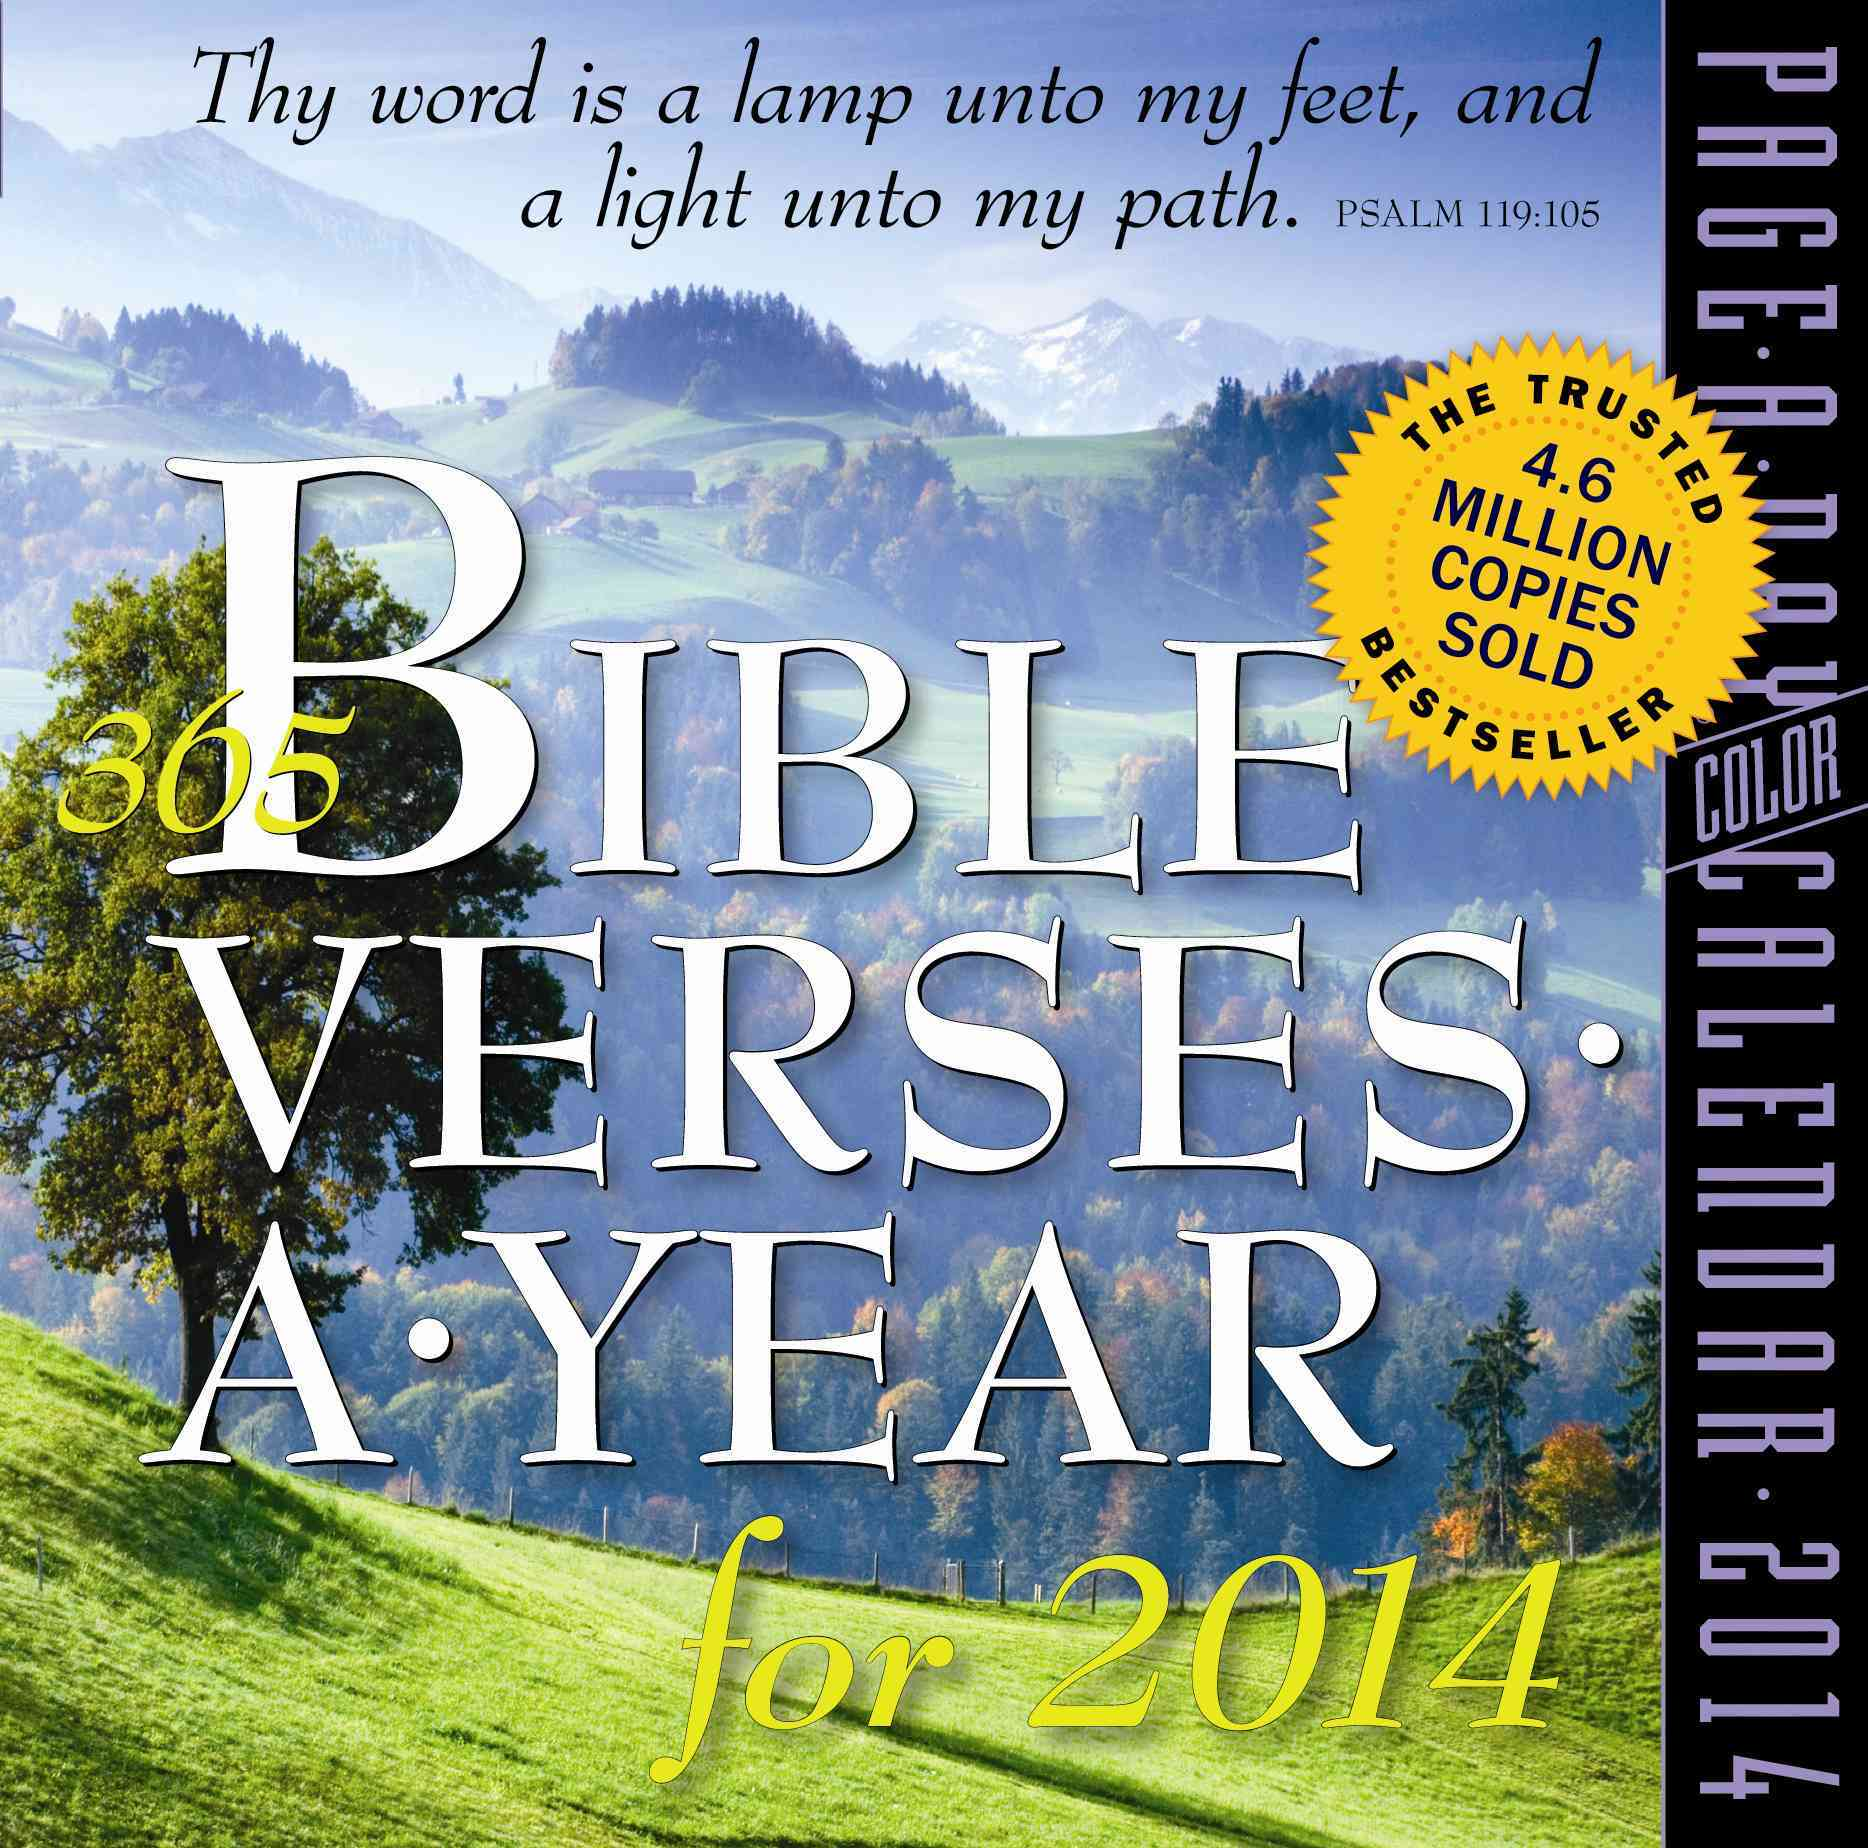 365 Bible Verses a Year 2014 Calendar (Calendar)